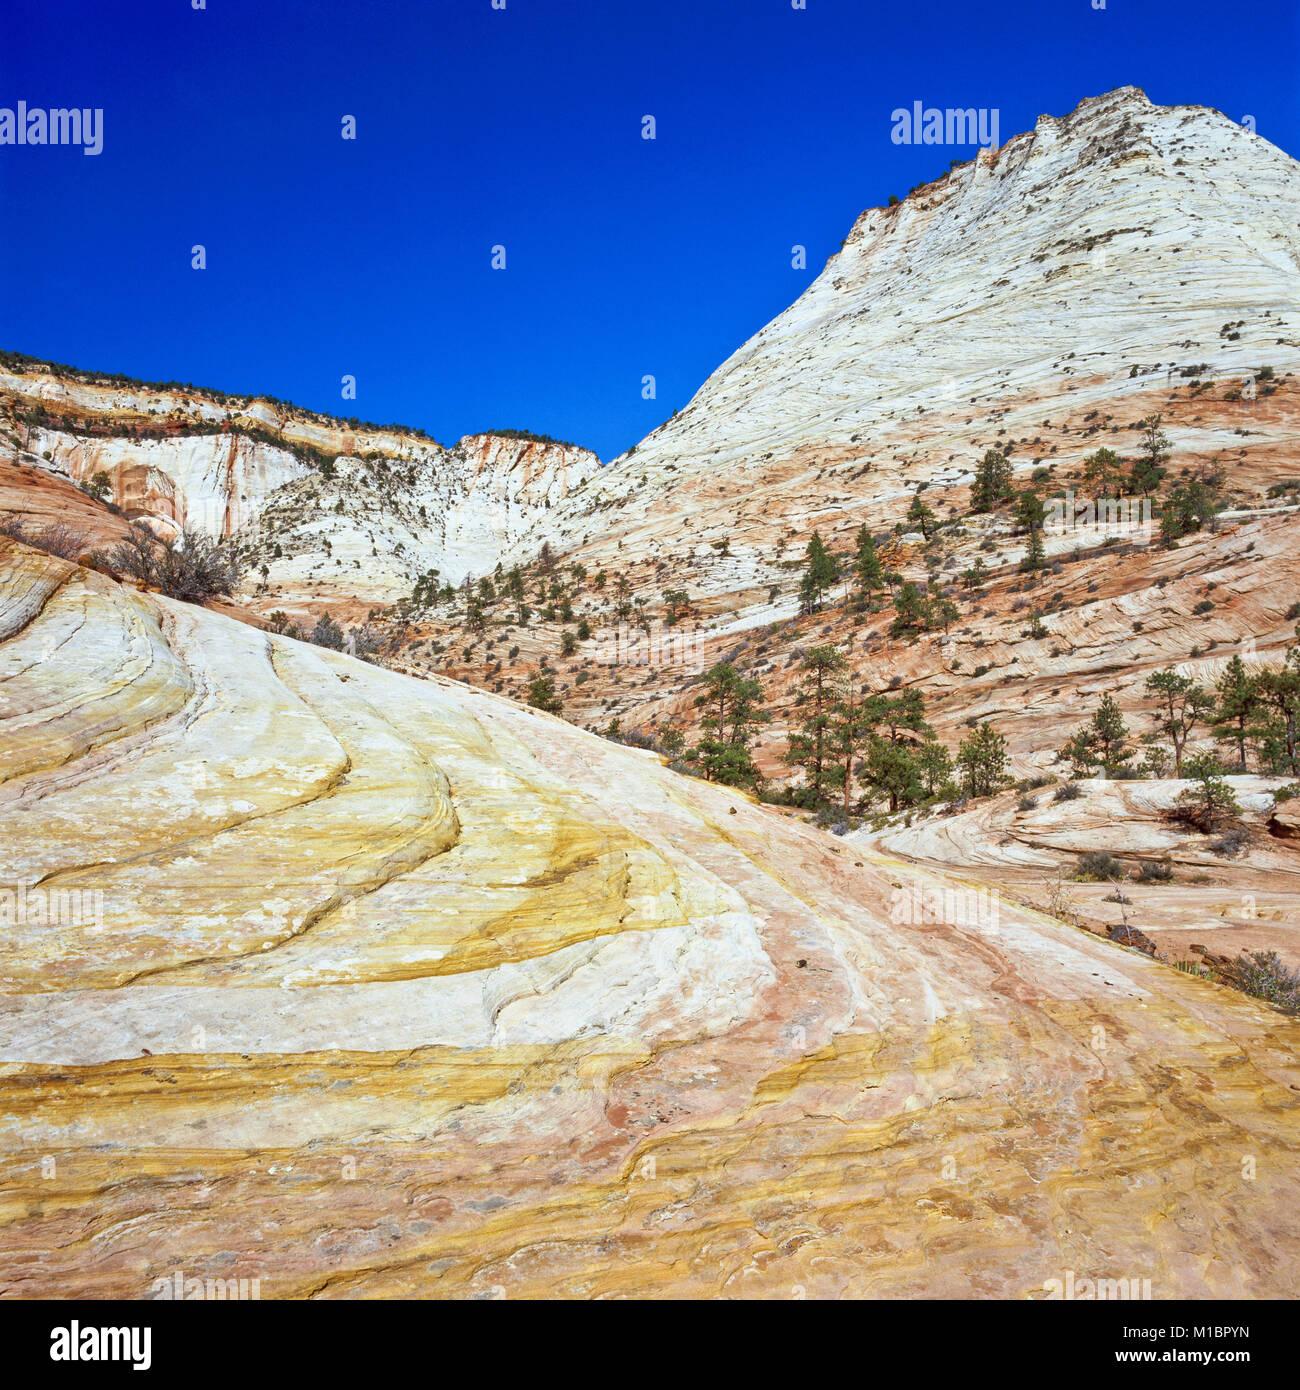 sandstone slickrock in the clear creek basin of zion national park, utah - Stock Image